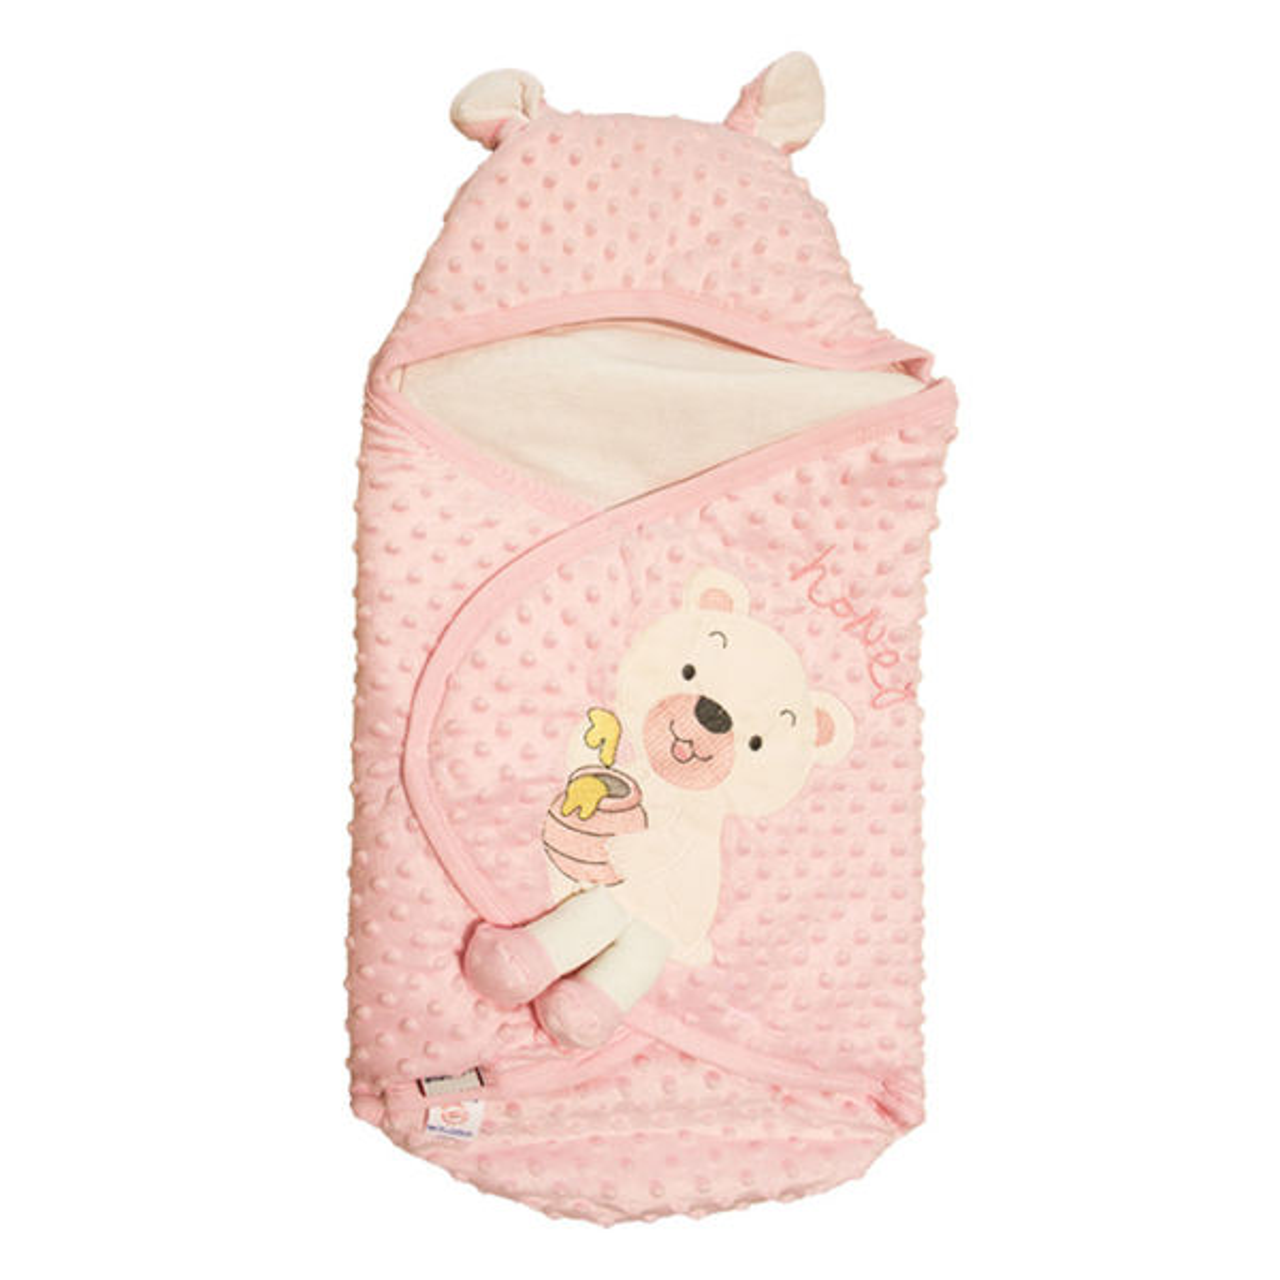 پتو قنداق نوزادی مدل 4505 Pink